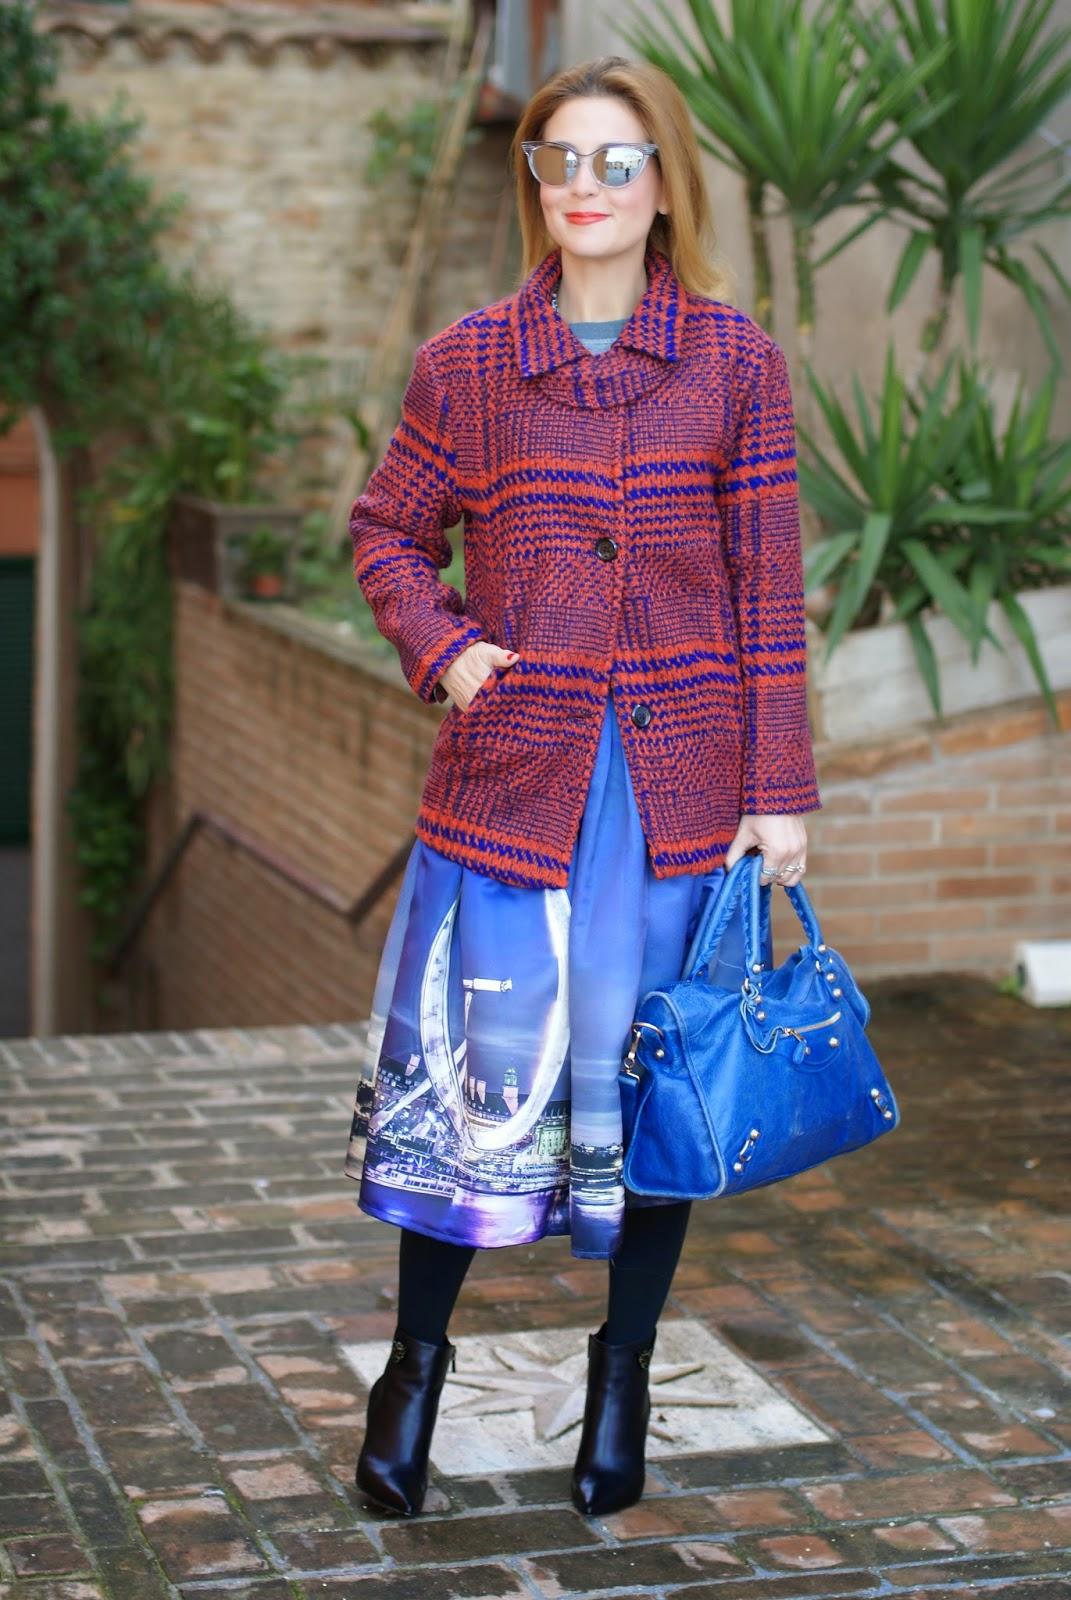 Chicwish London Skyline print, London Eye print midi skirt, Blackfive check coat, Le Silla shoes, Fashion and Cookies, fashion blogger